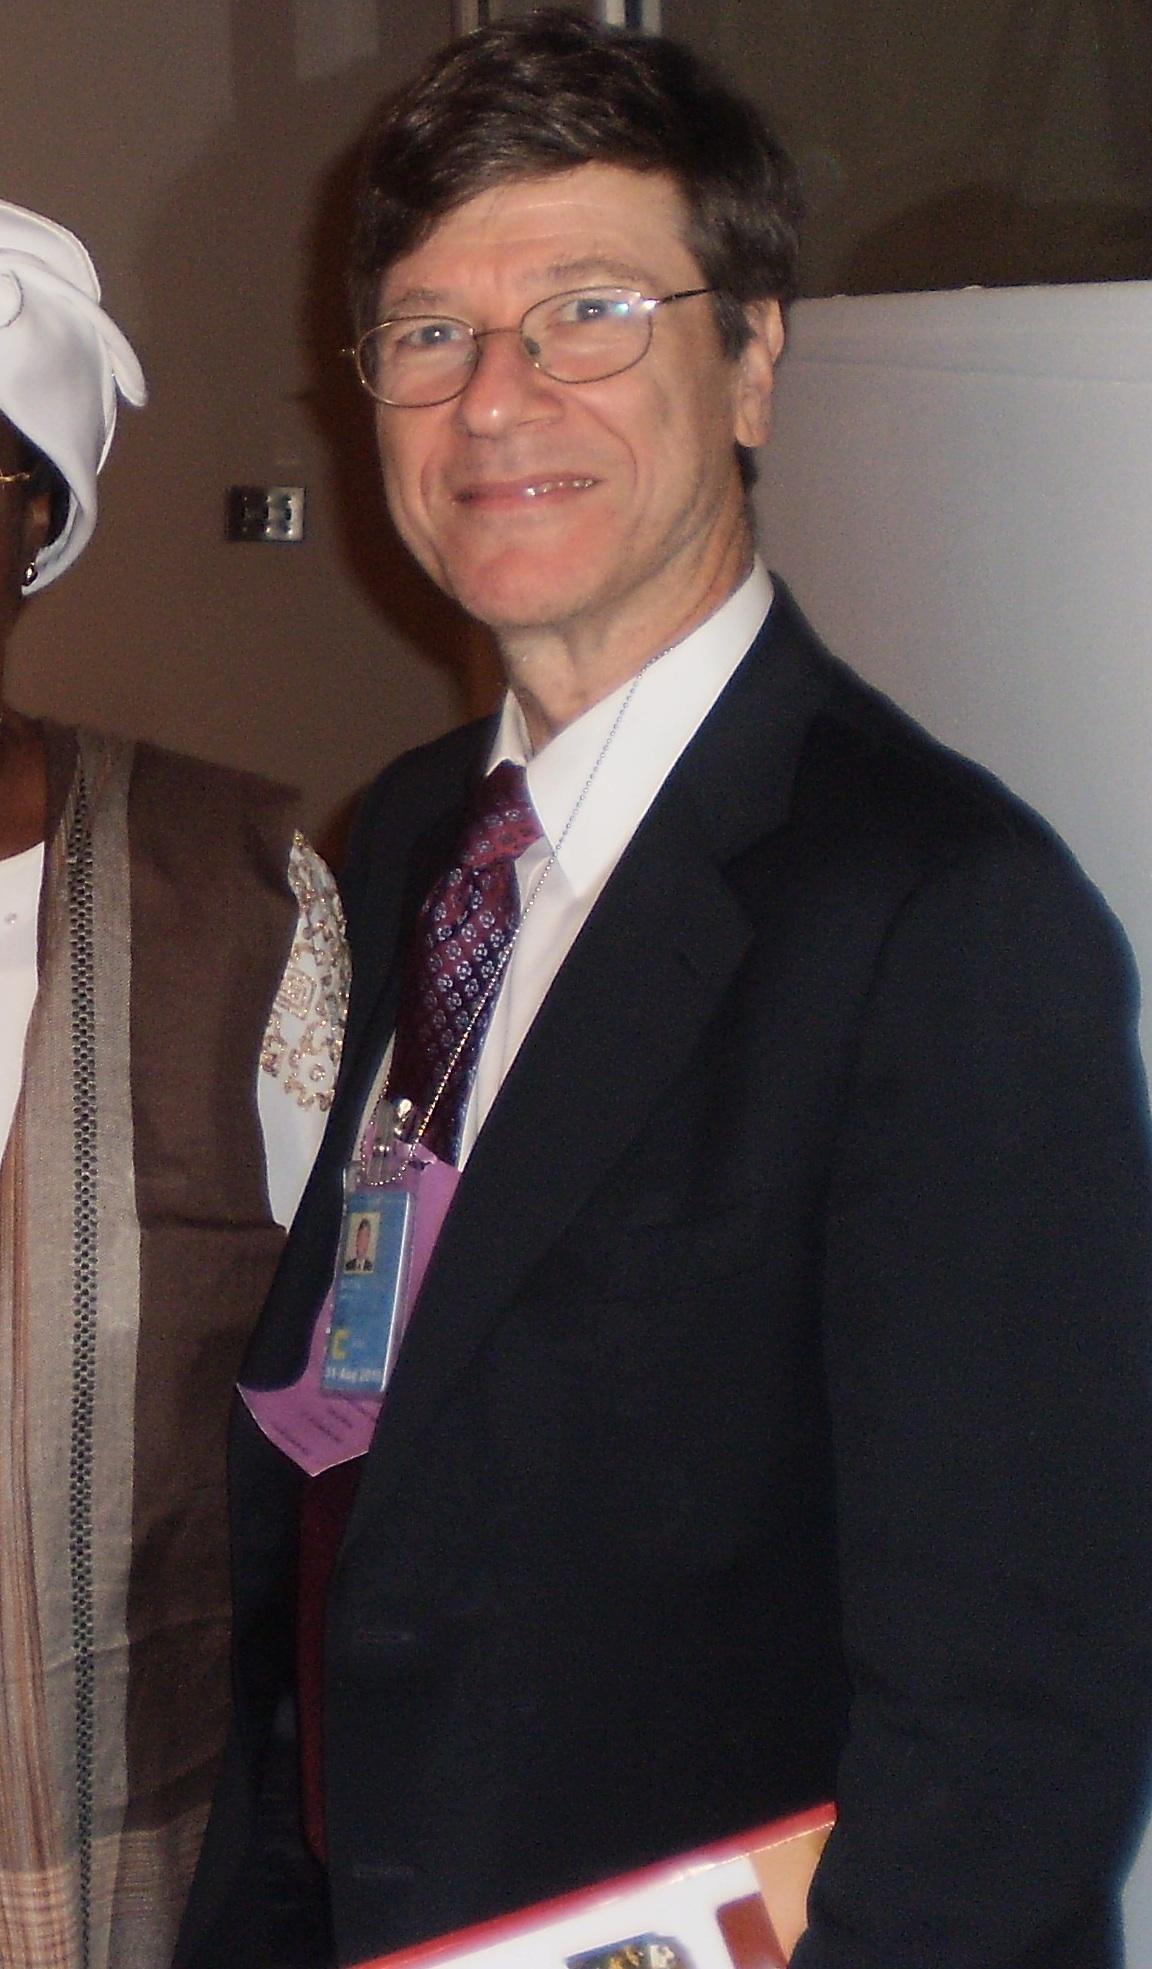 Sachs_at_UN 2009